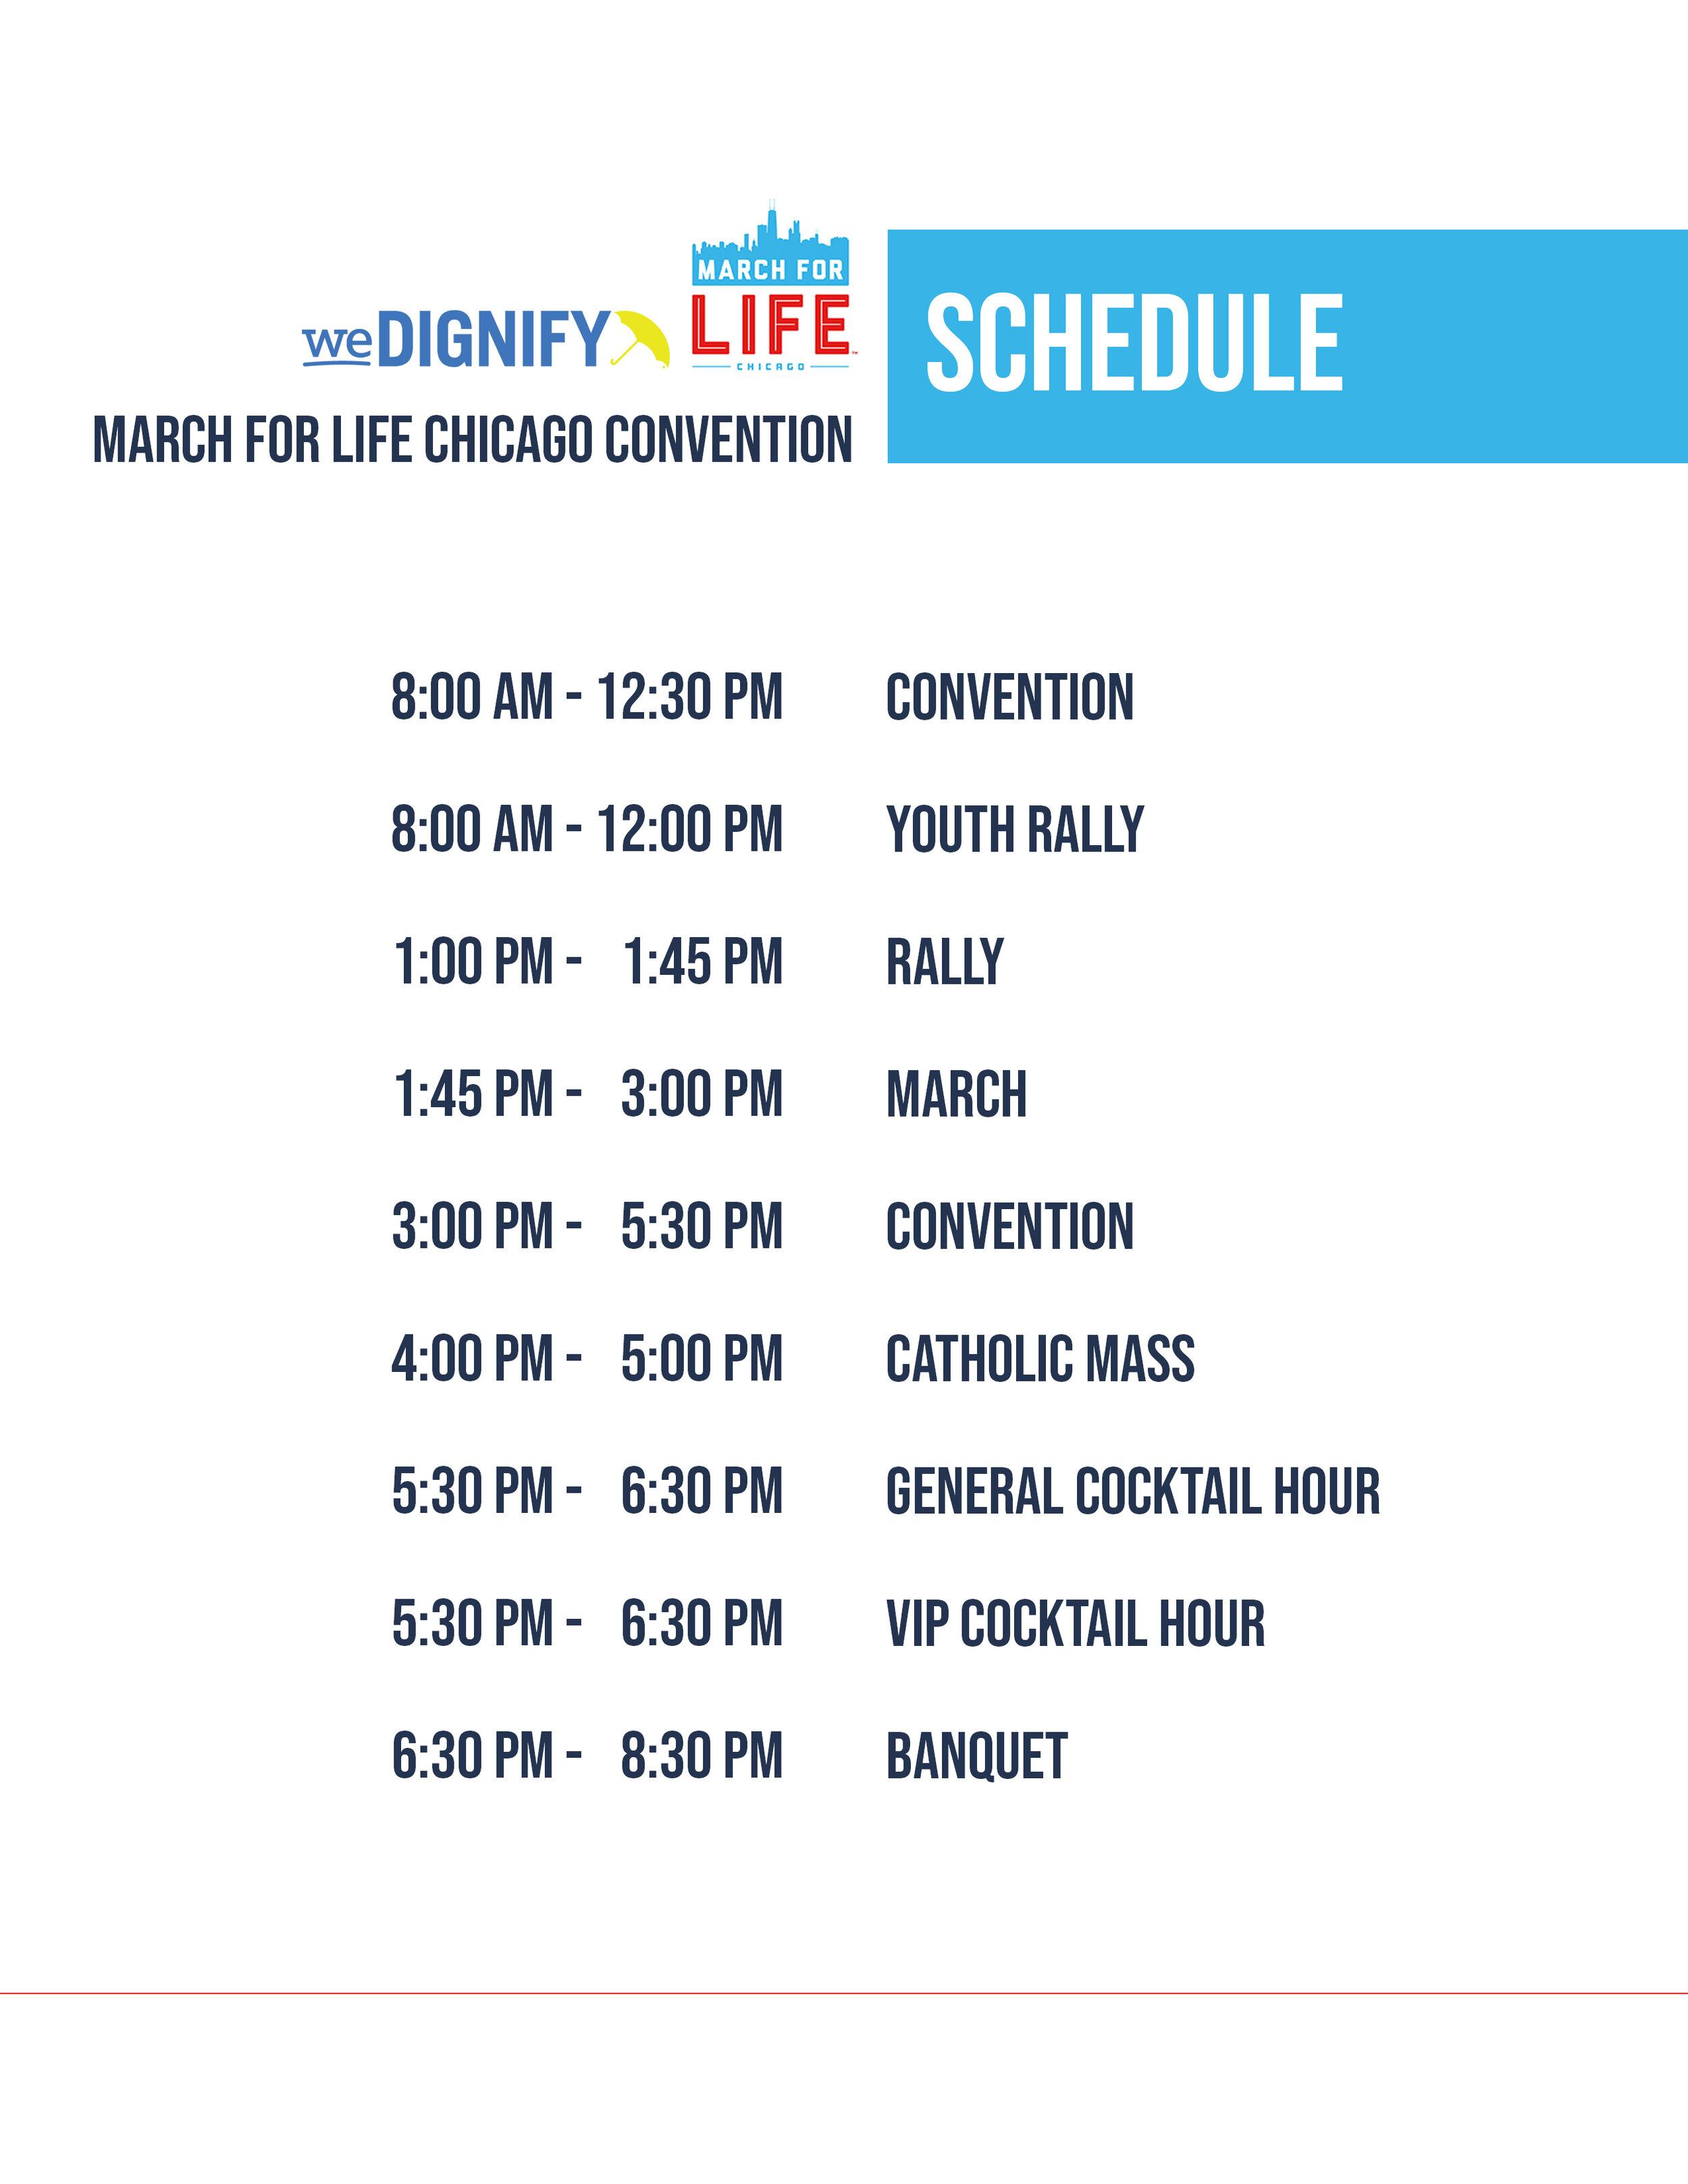 schedule-mockup3a.jpg